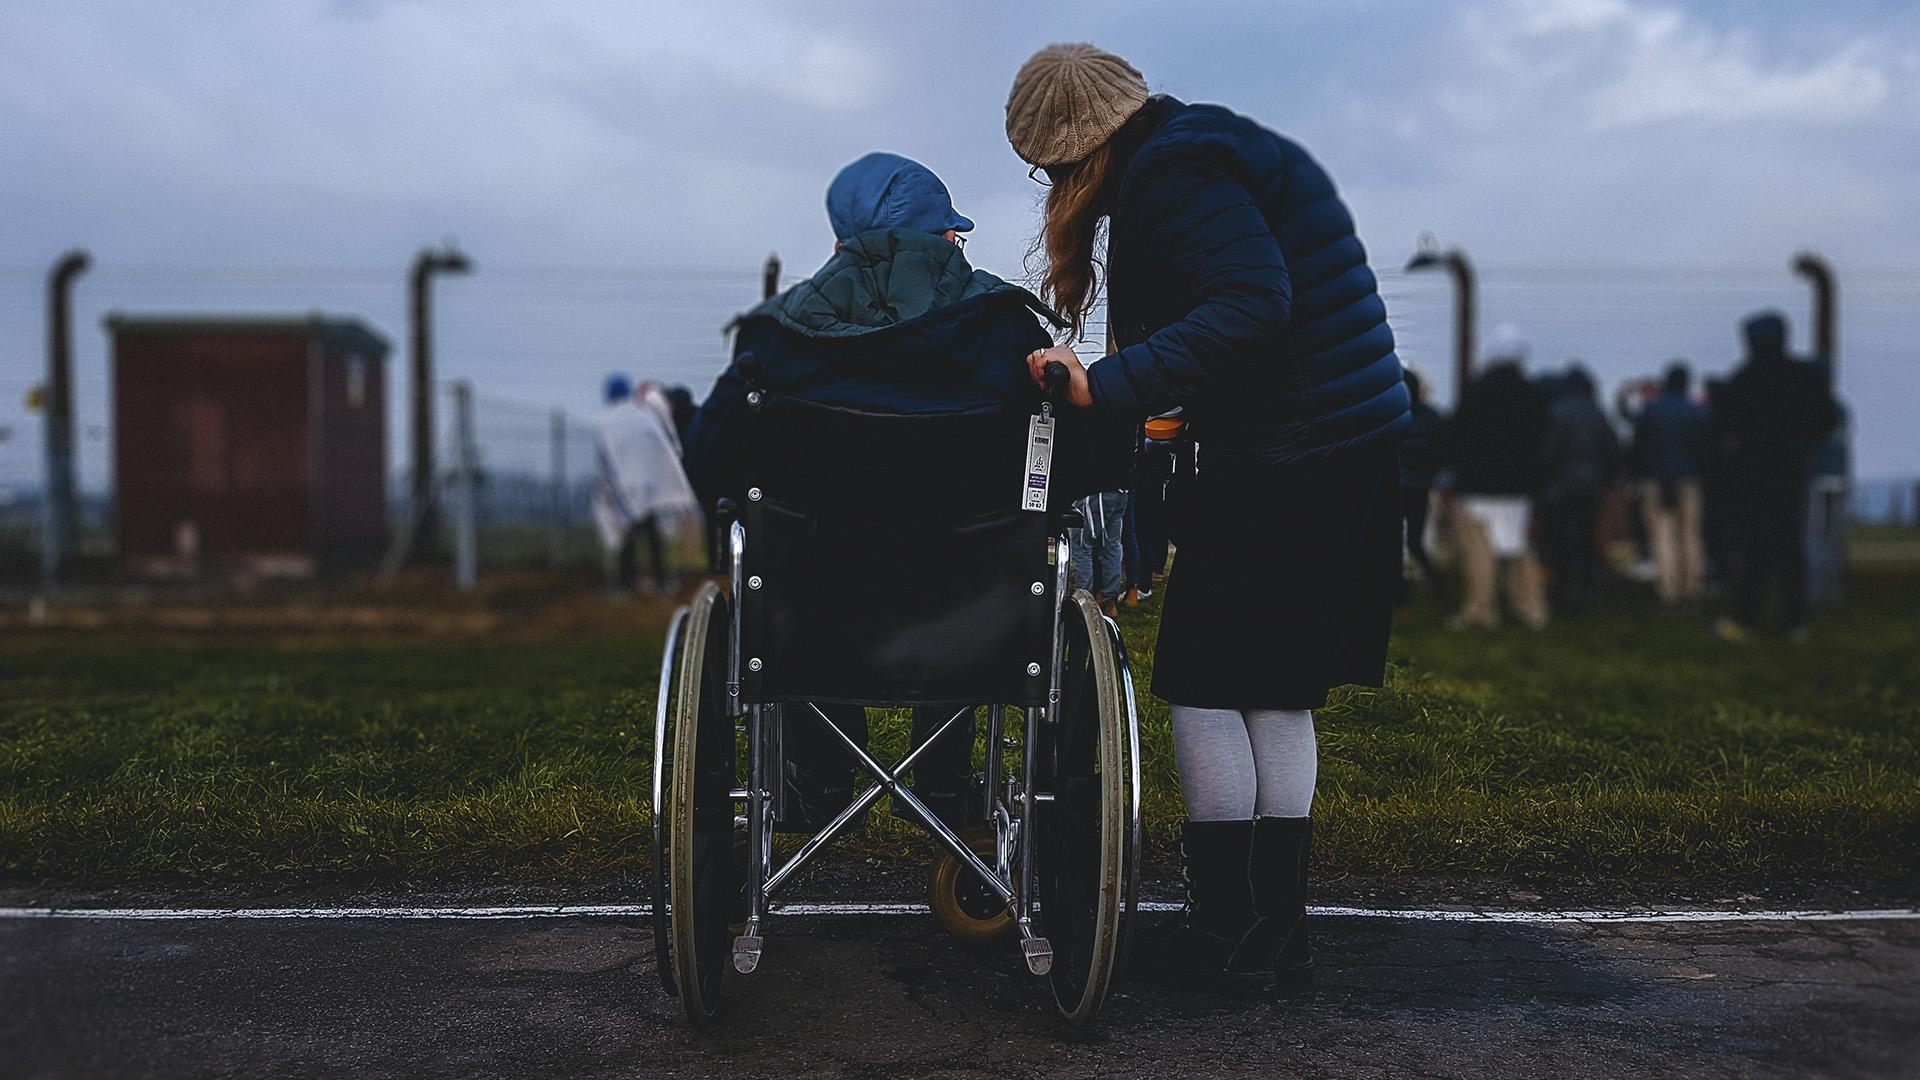 Clinical Trial Could Help Paraplegics Walk Trial In Australia